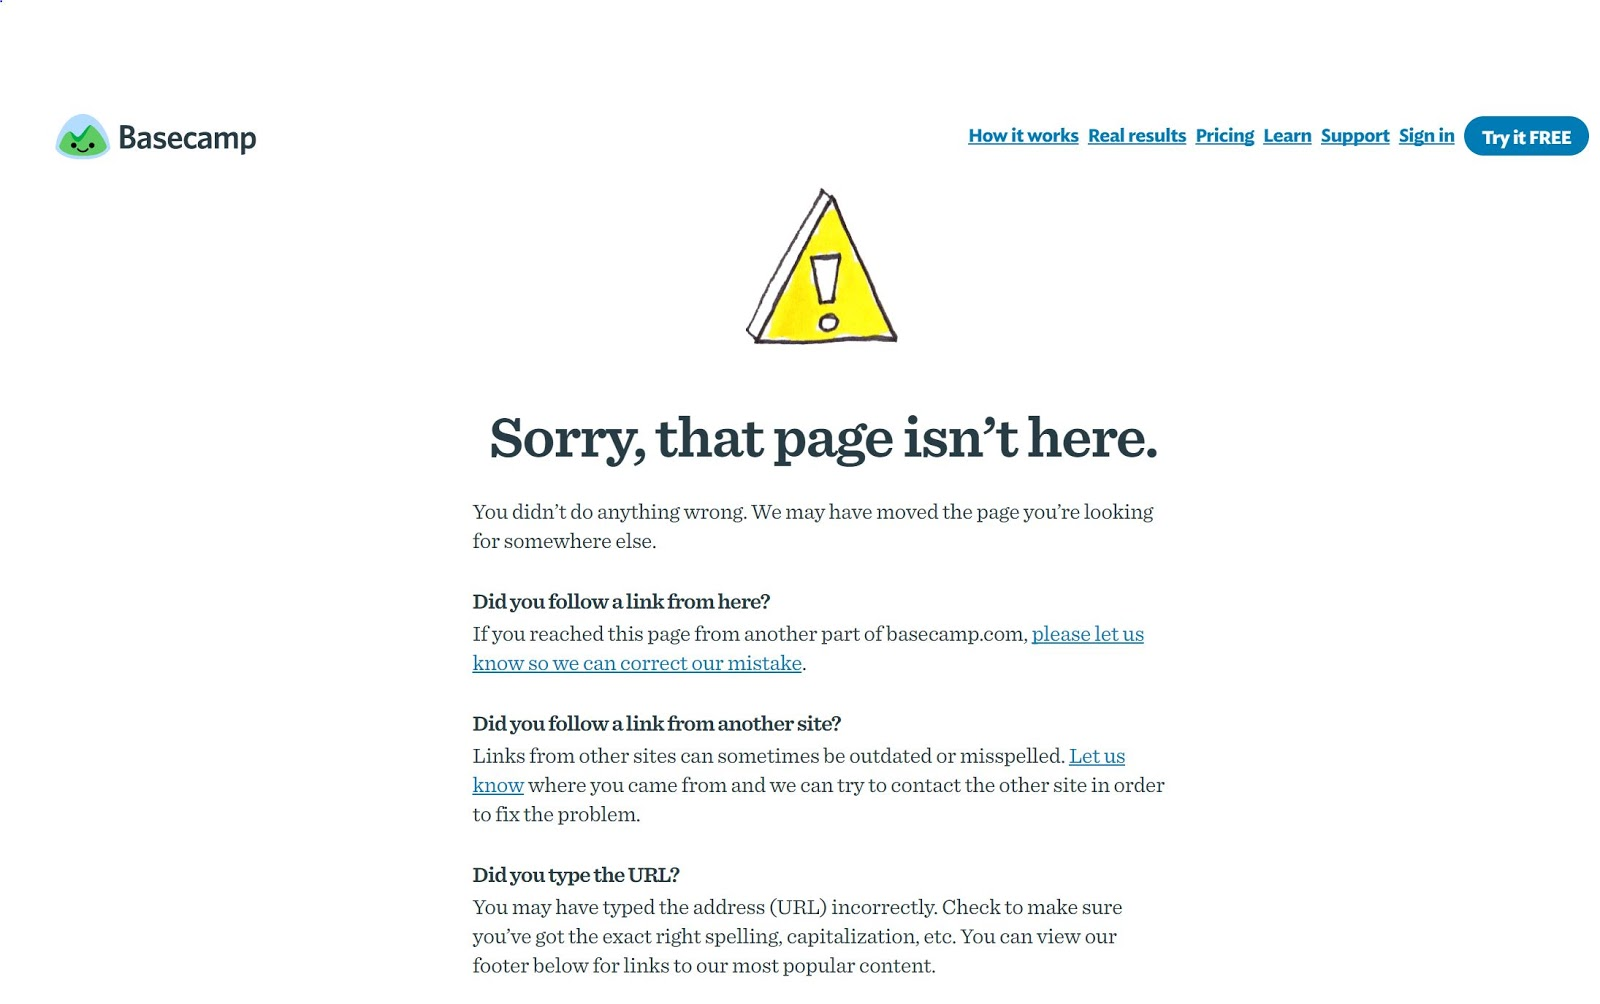 Basecamp 404 page